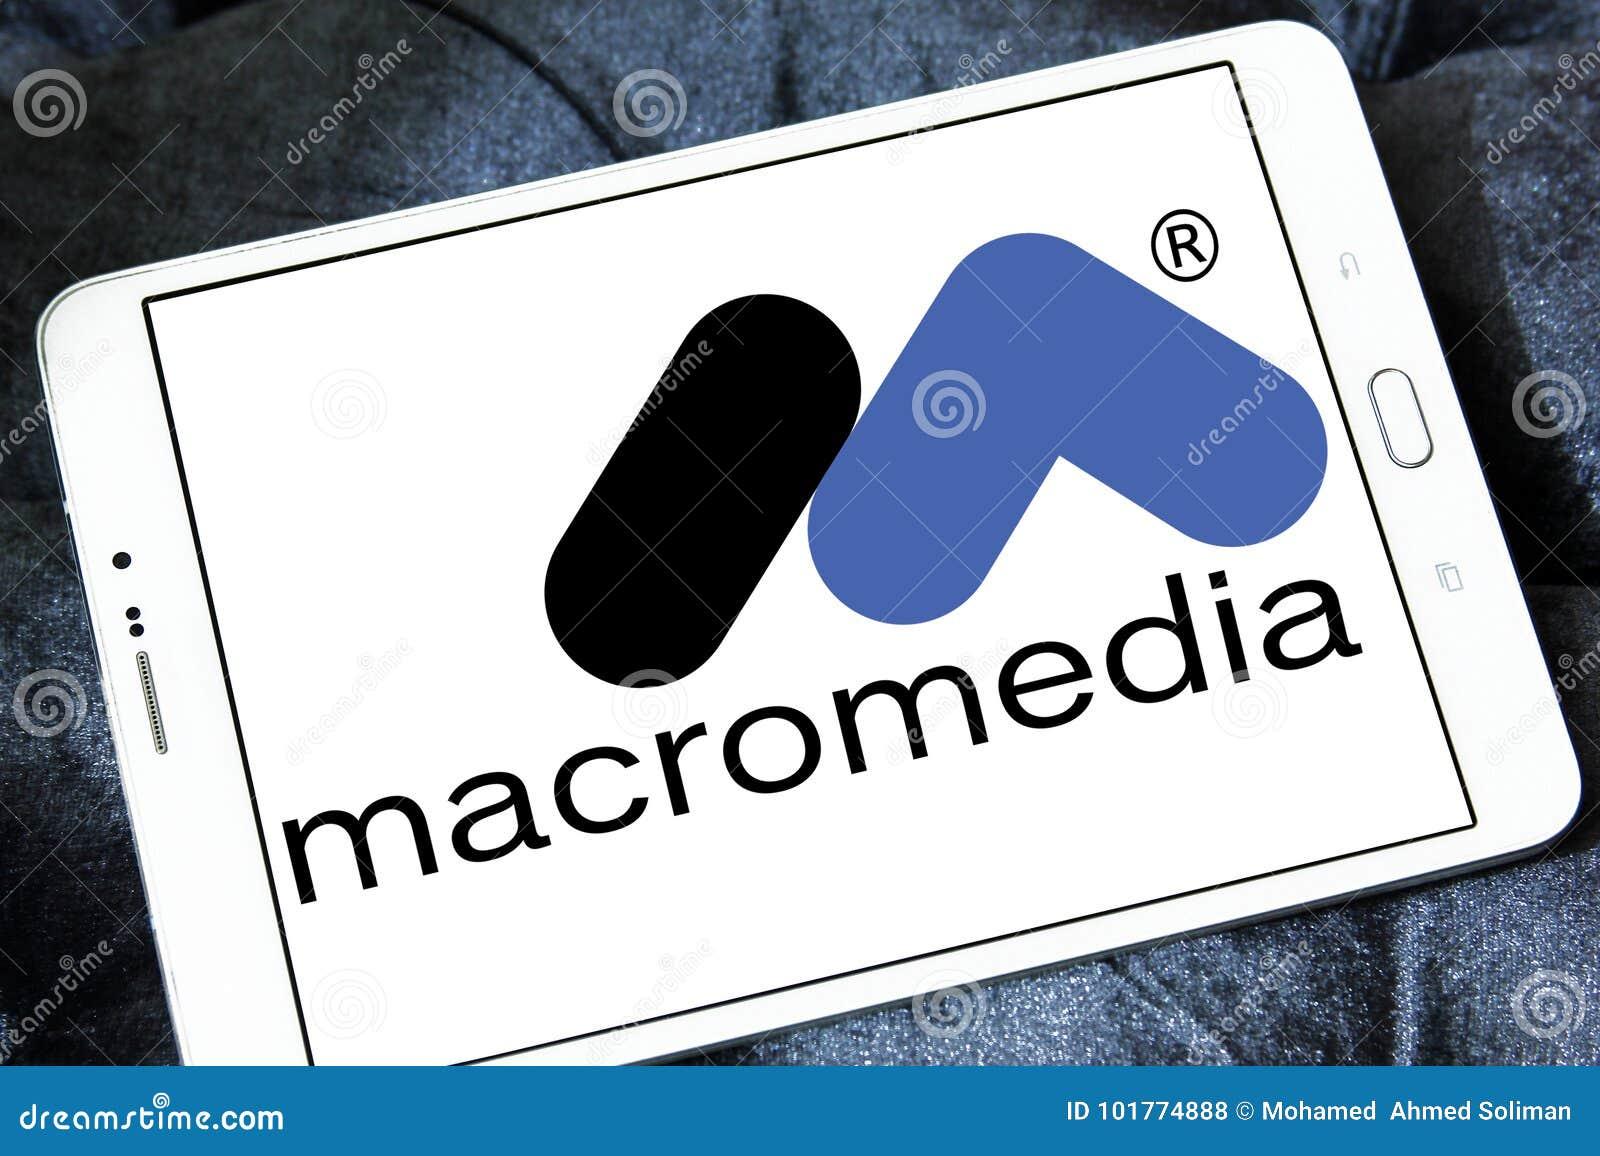 Macromedia Software Company Logo Editorial Stock Photo - Image of